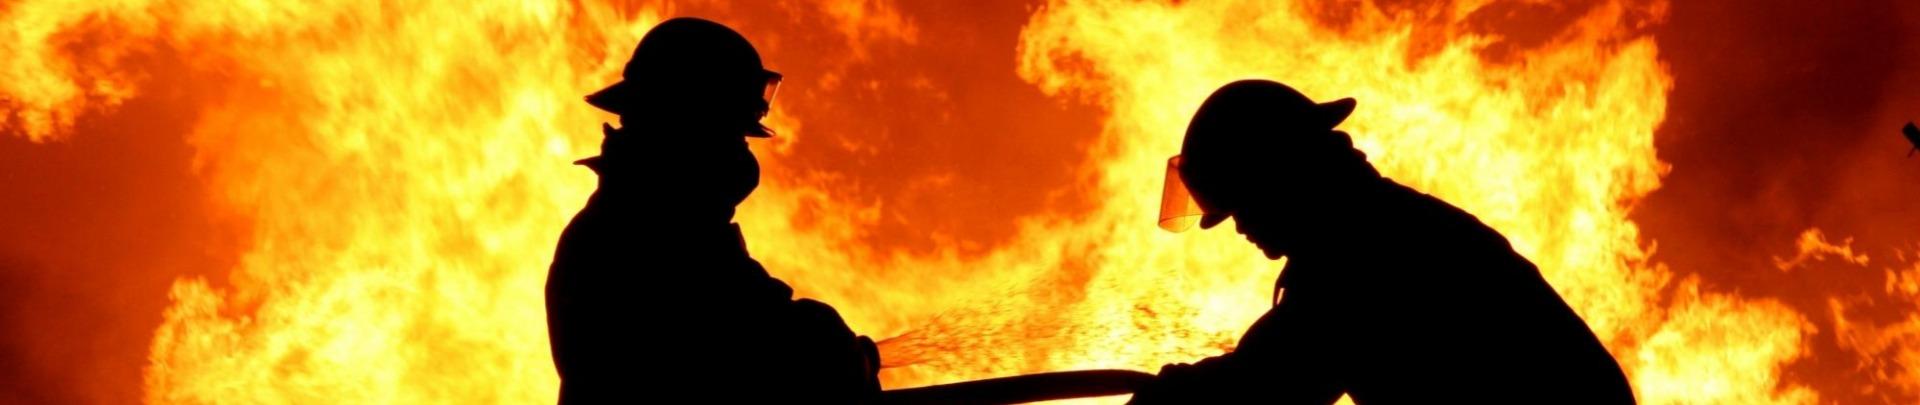 2 mannen bestrijden vuur